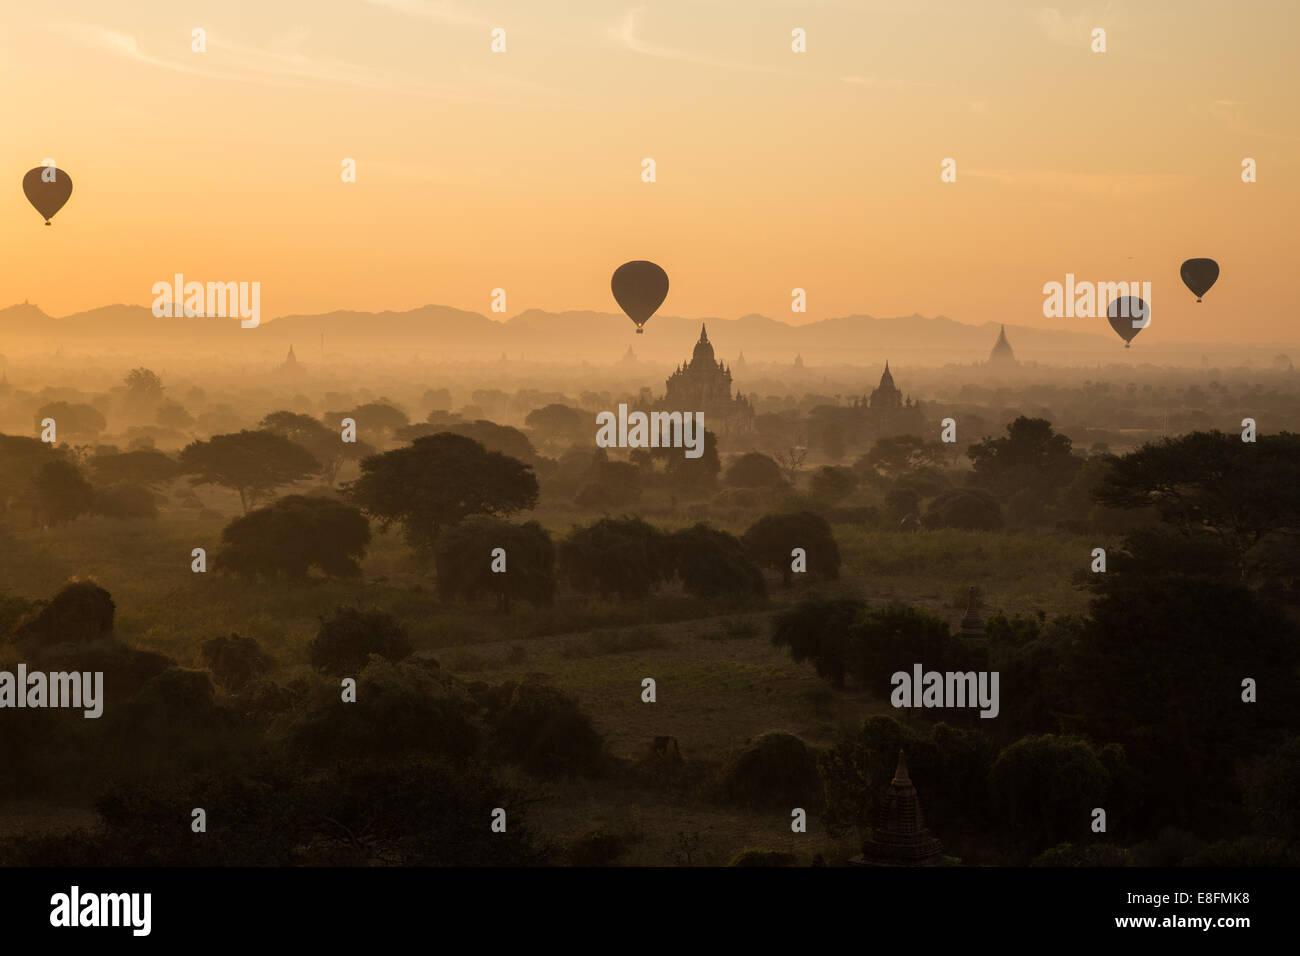 Myanmar Hot Air Balloons At The Sunrise, Bagan - Stock Image